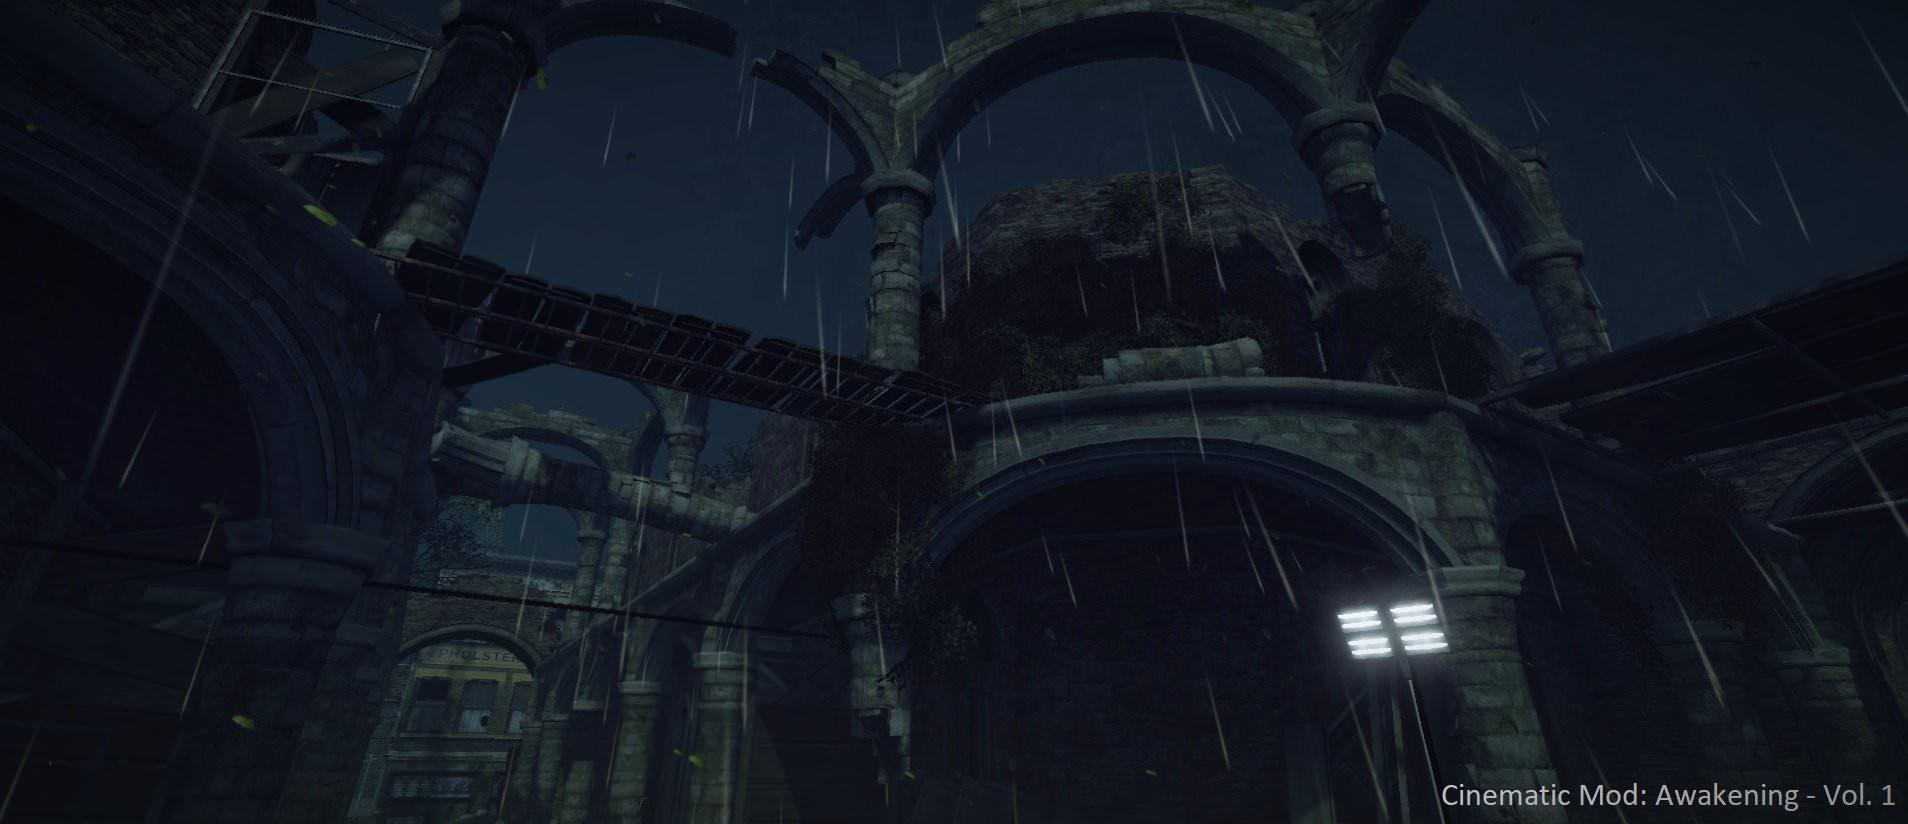 Cinematic Mod Awakening Volume 1 - Half-Life 2